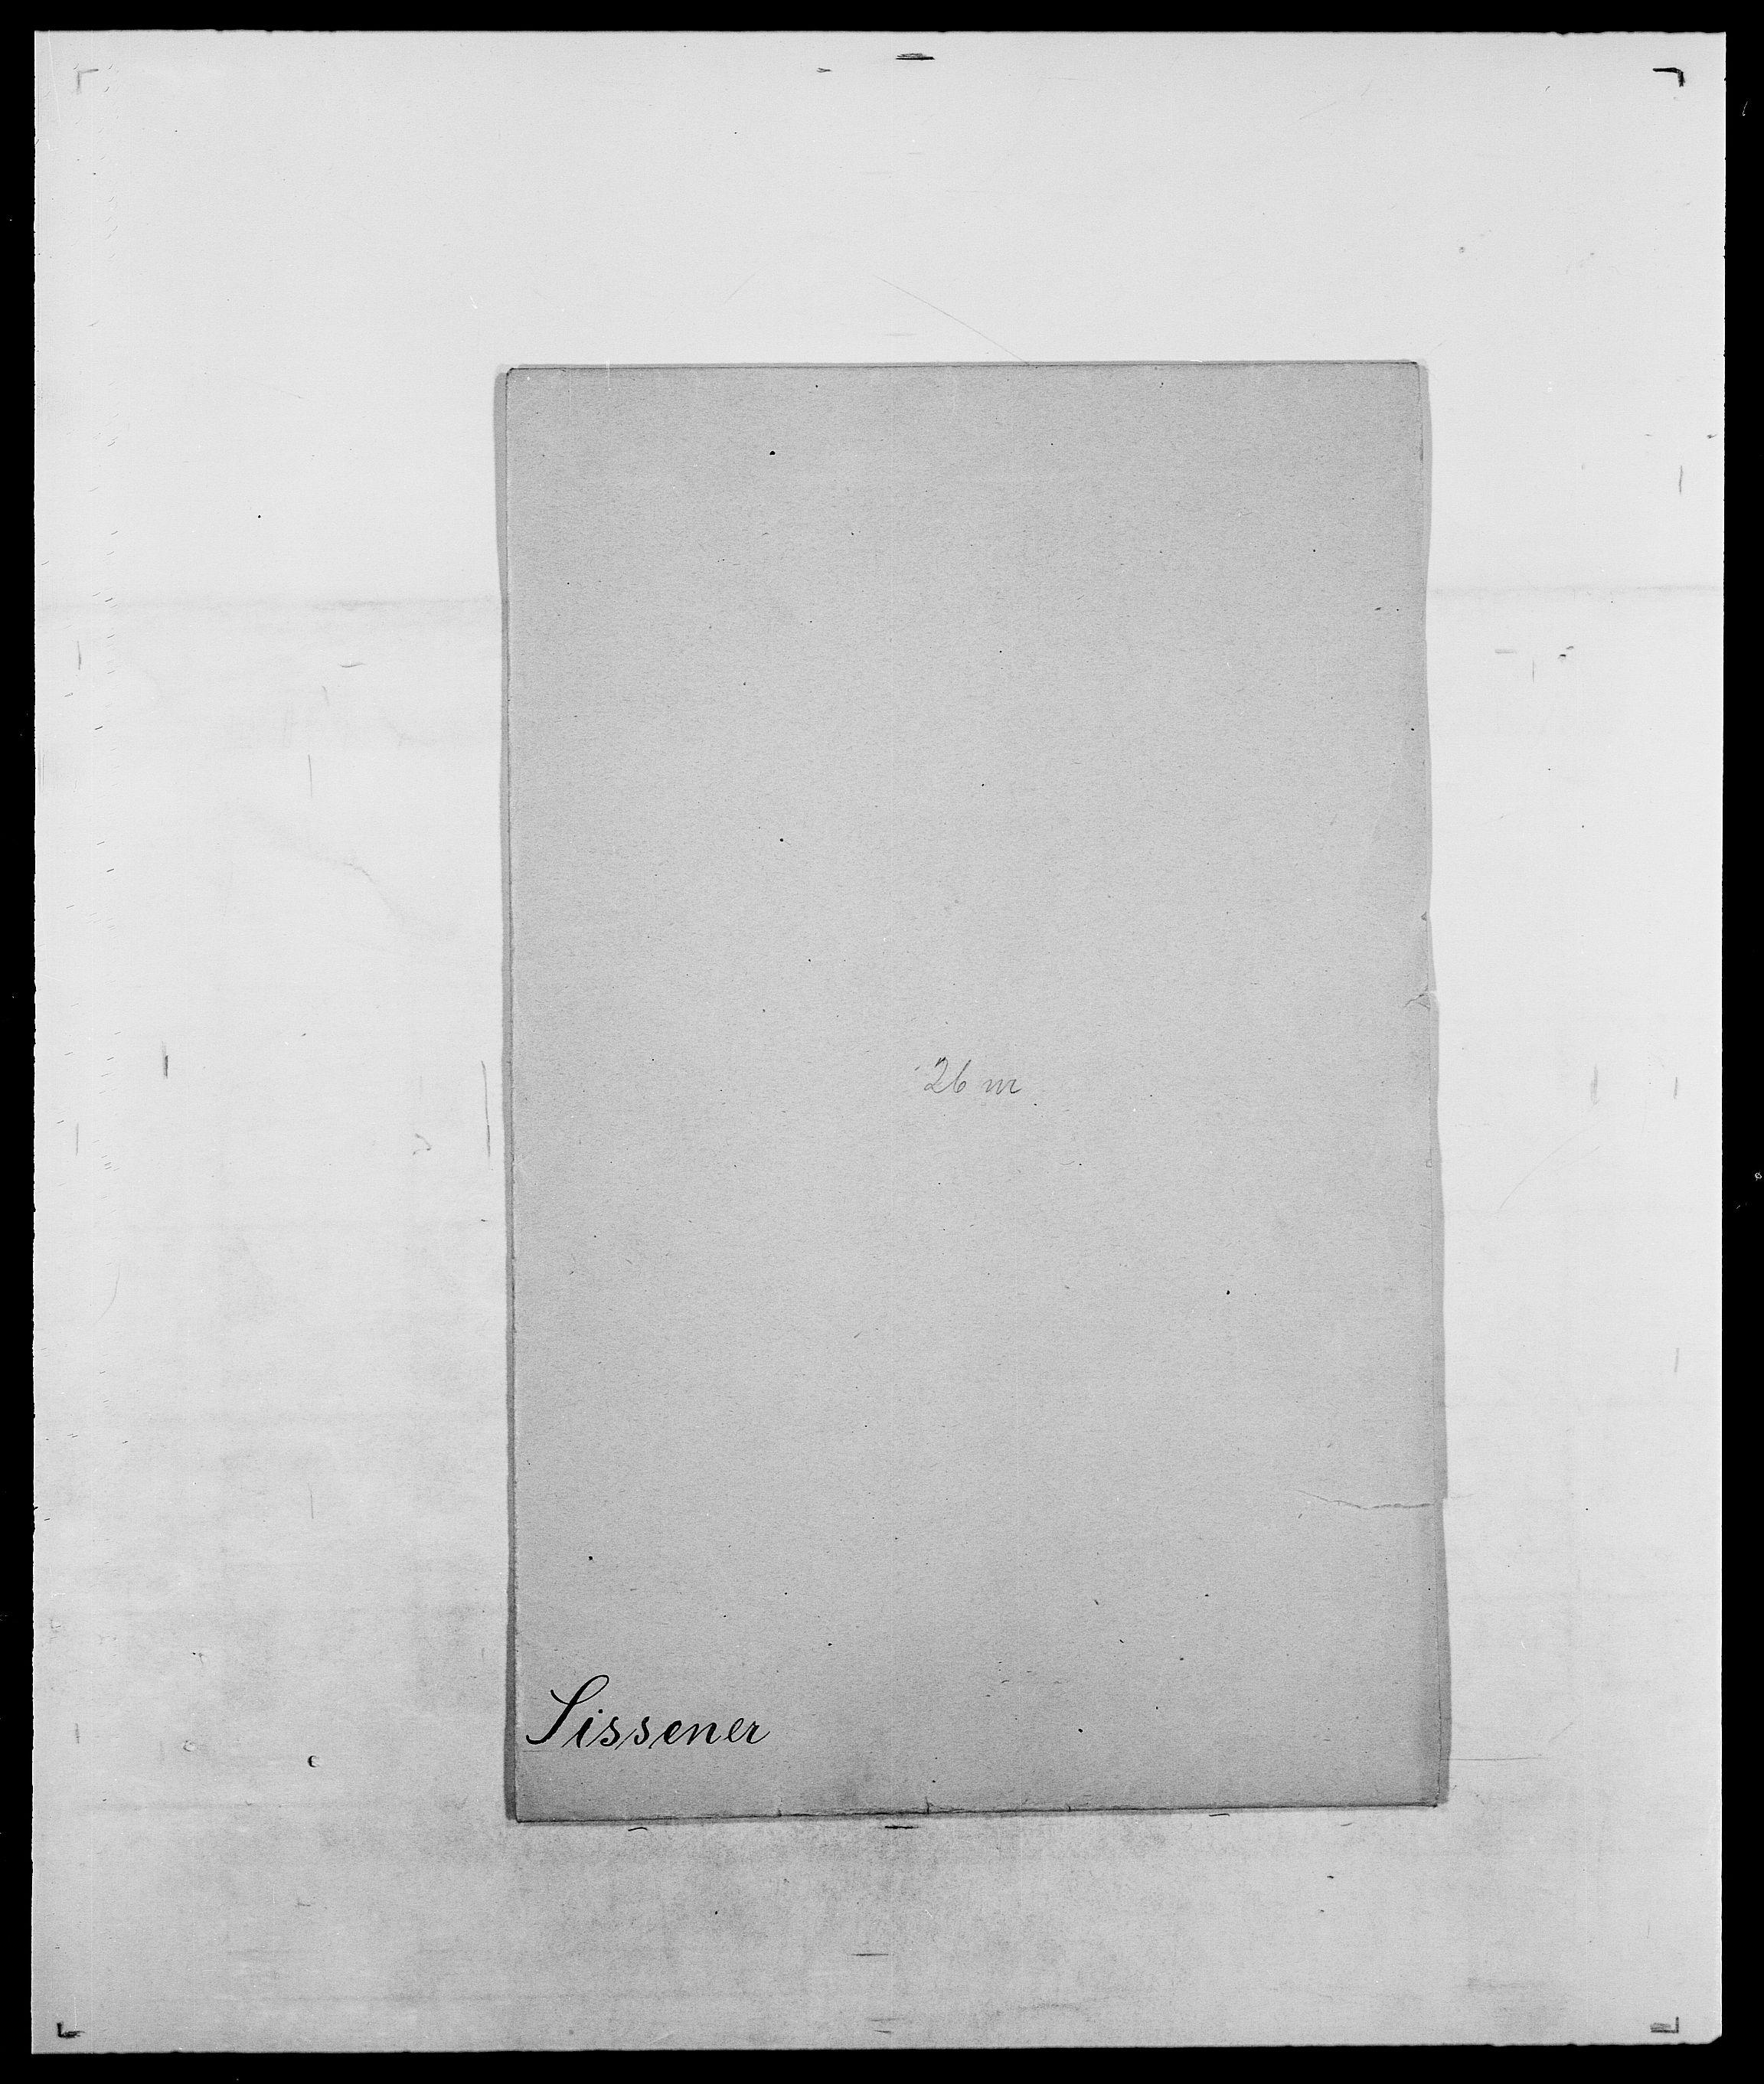 SAO, Delgobe, Charles Antoine - samling, D/Da/L0035: Schnabel - sjetman, s. 950